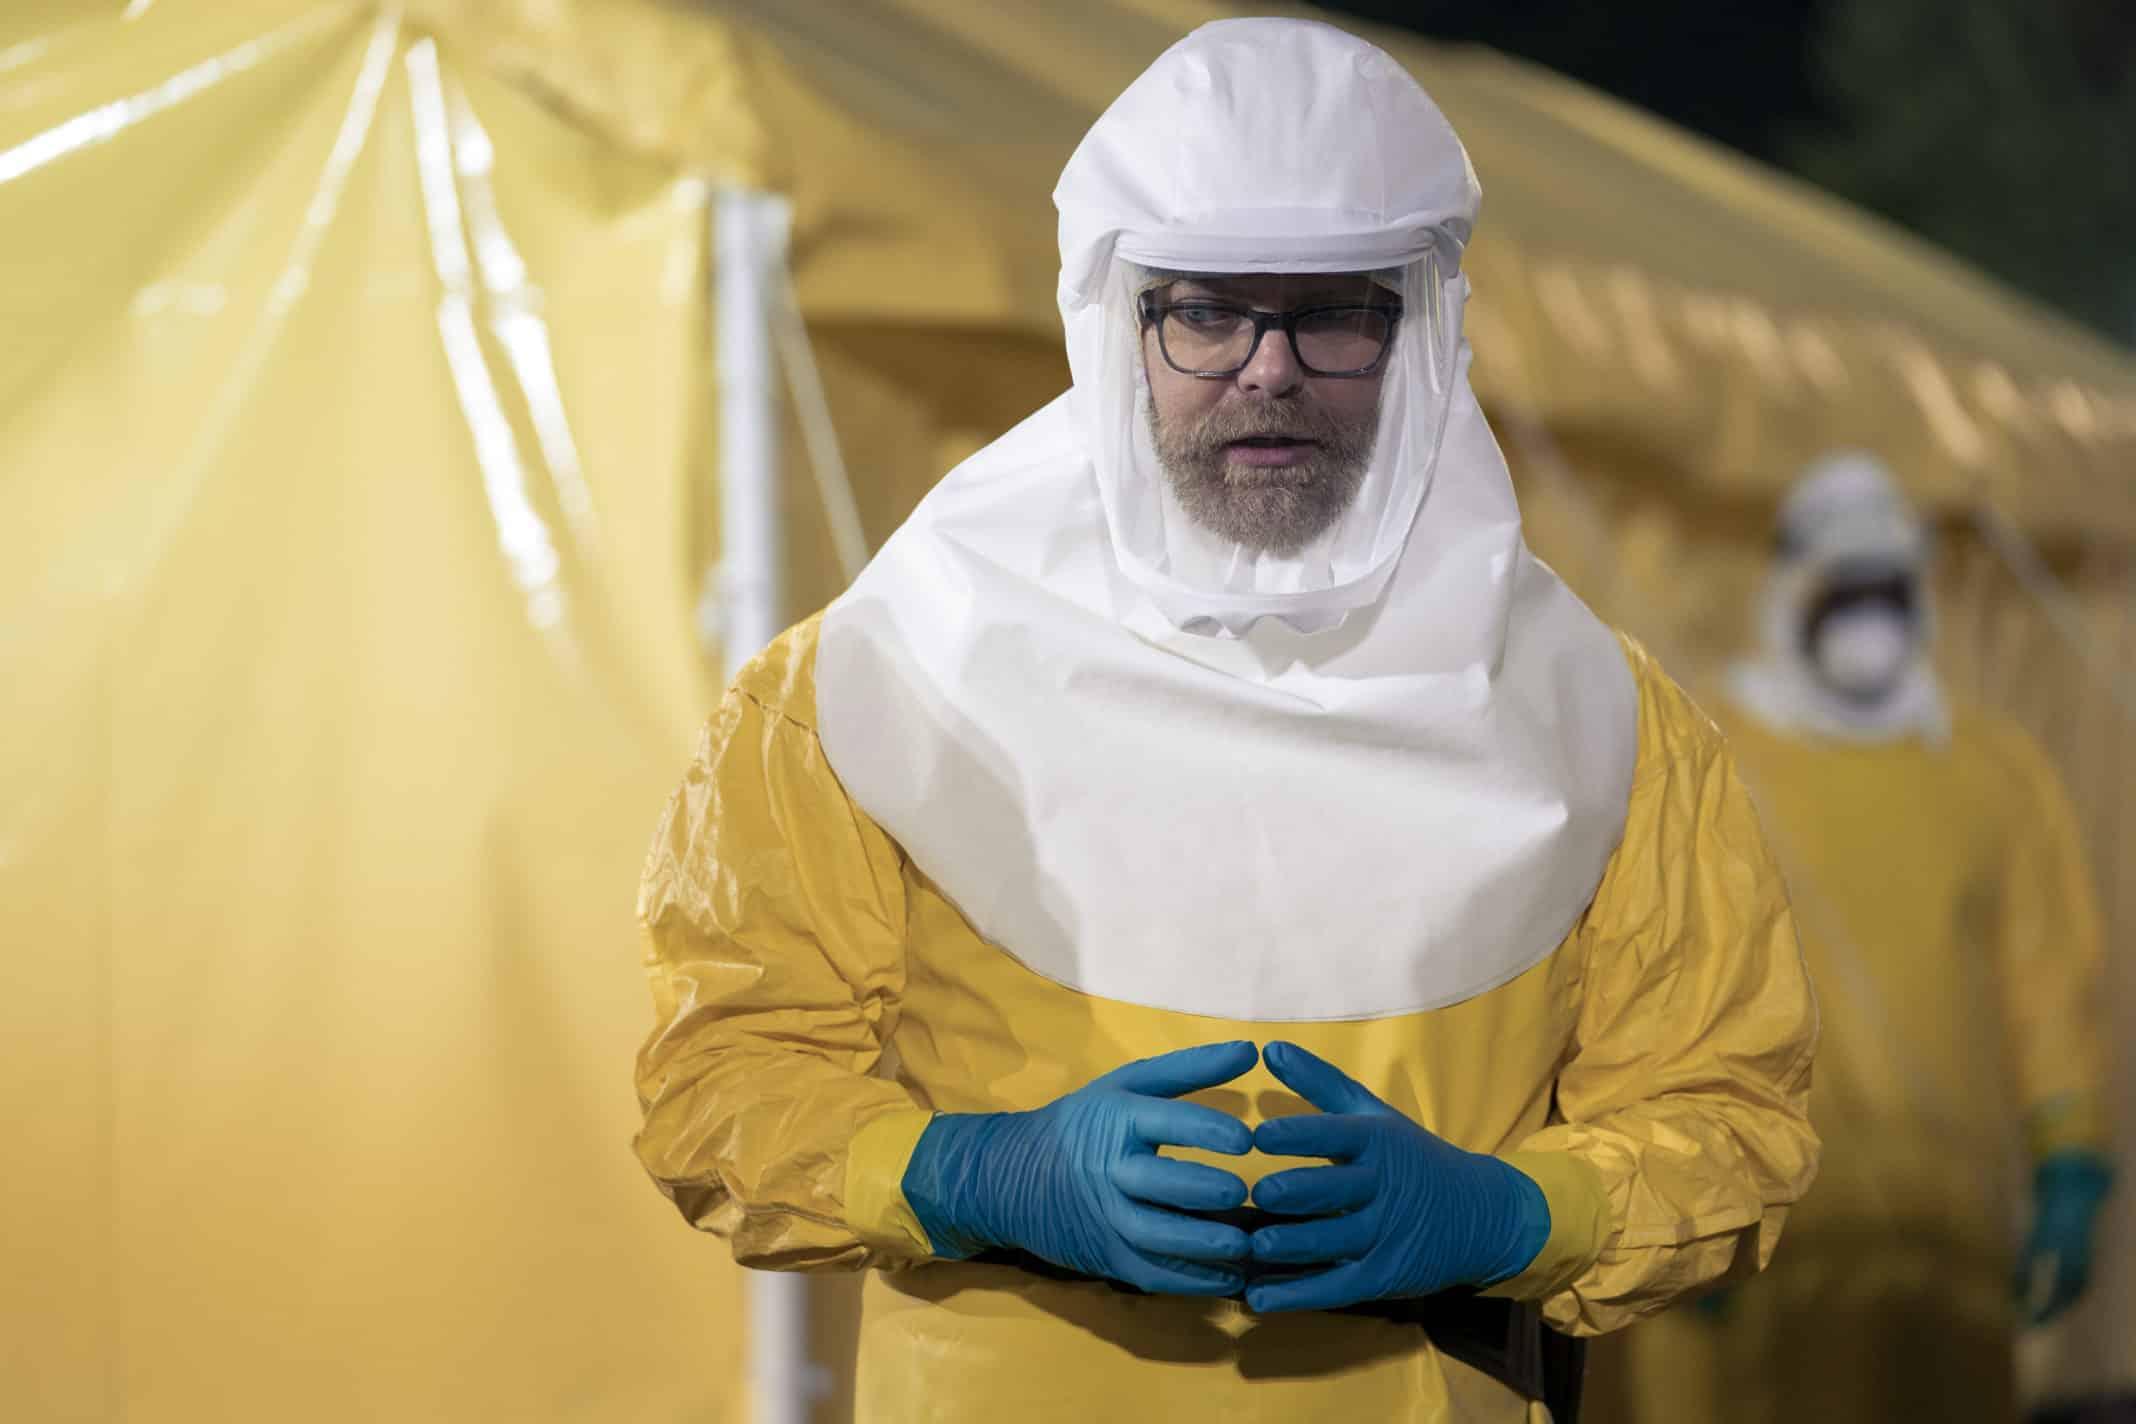 Dr. Michael Stevens (Rainn Wilson) in a hazmat suit.